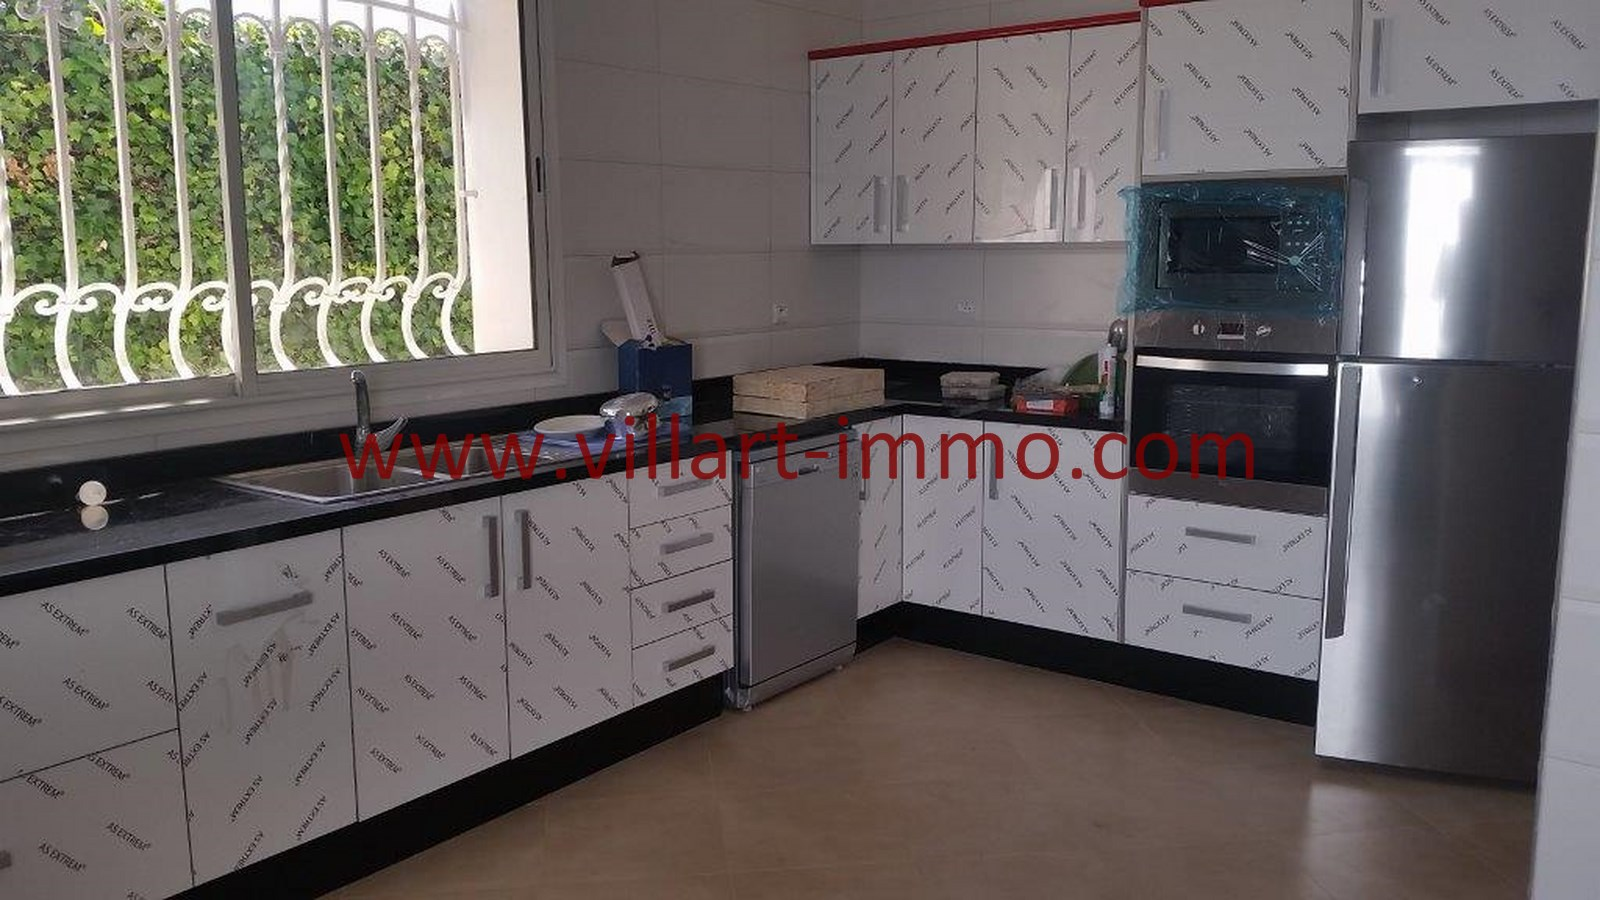 9-vente-villa-tanger-la-montagne-cuisine-1-vv450-villart-immo